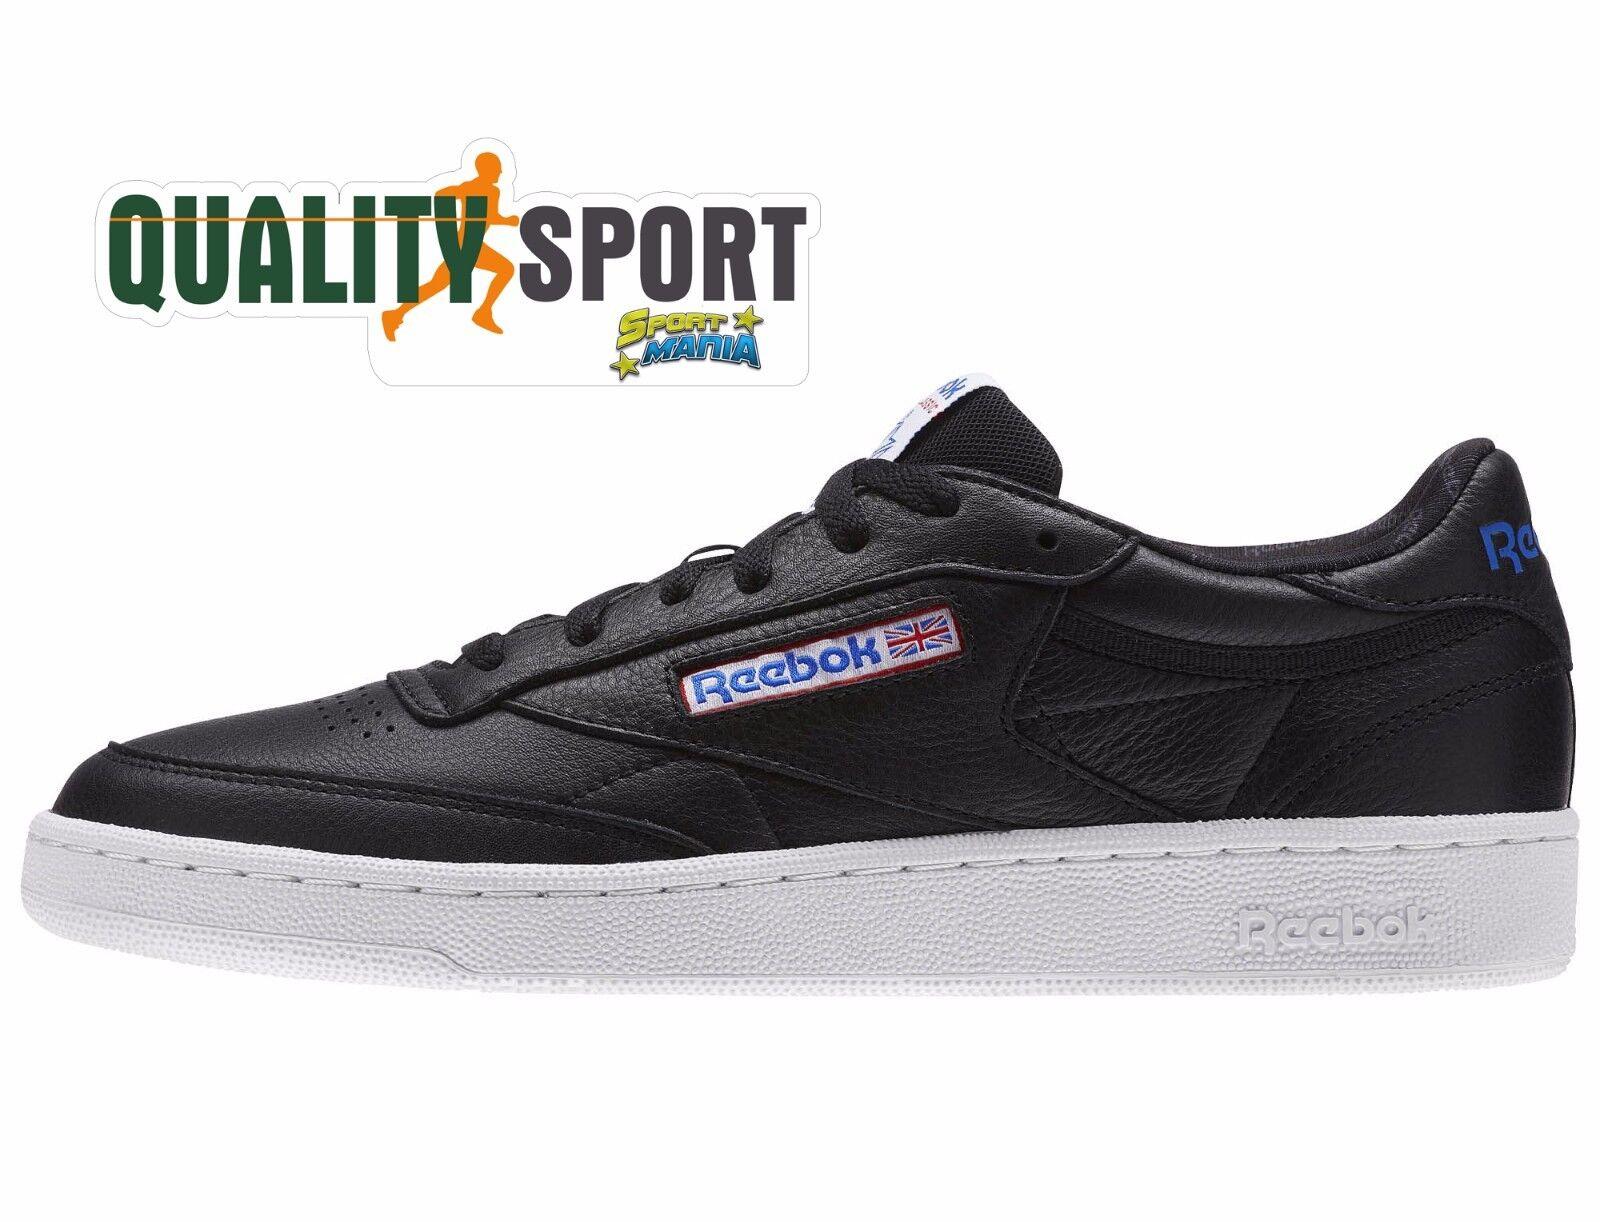 Reebok Club C 85 Nero Uomo Scarpe Shoes Sportive  BS5213